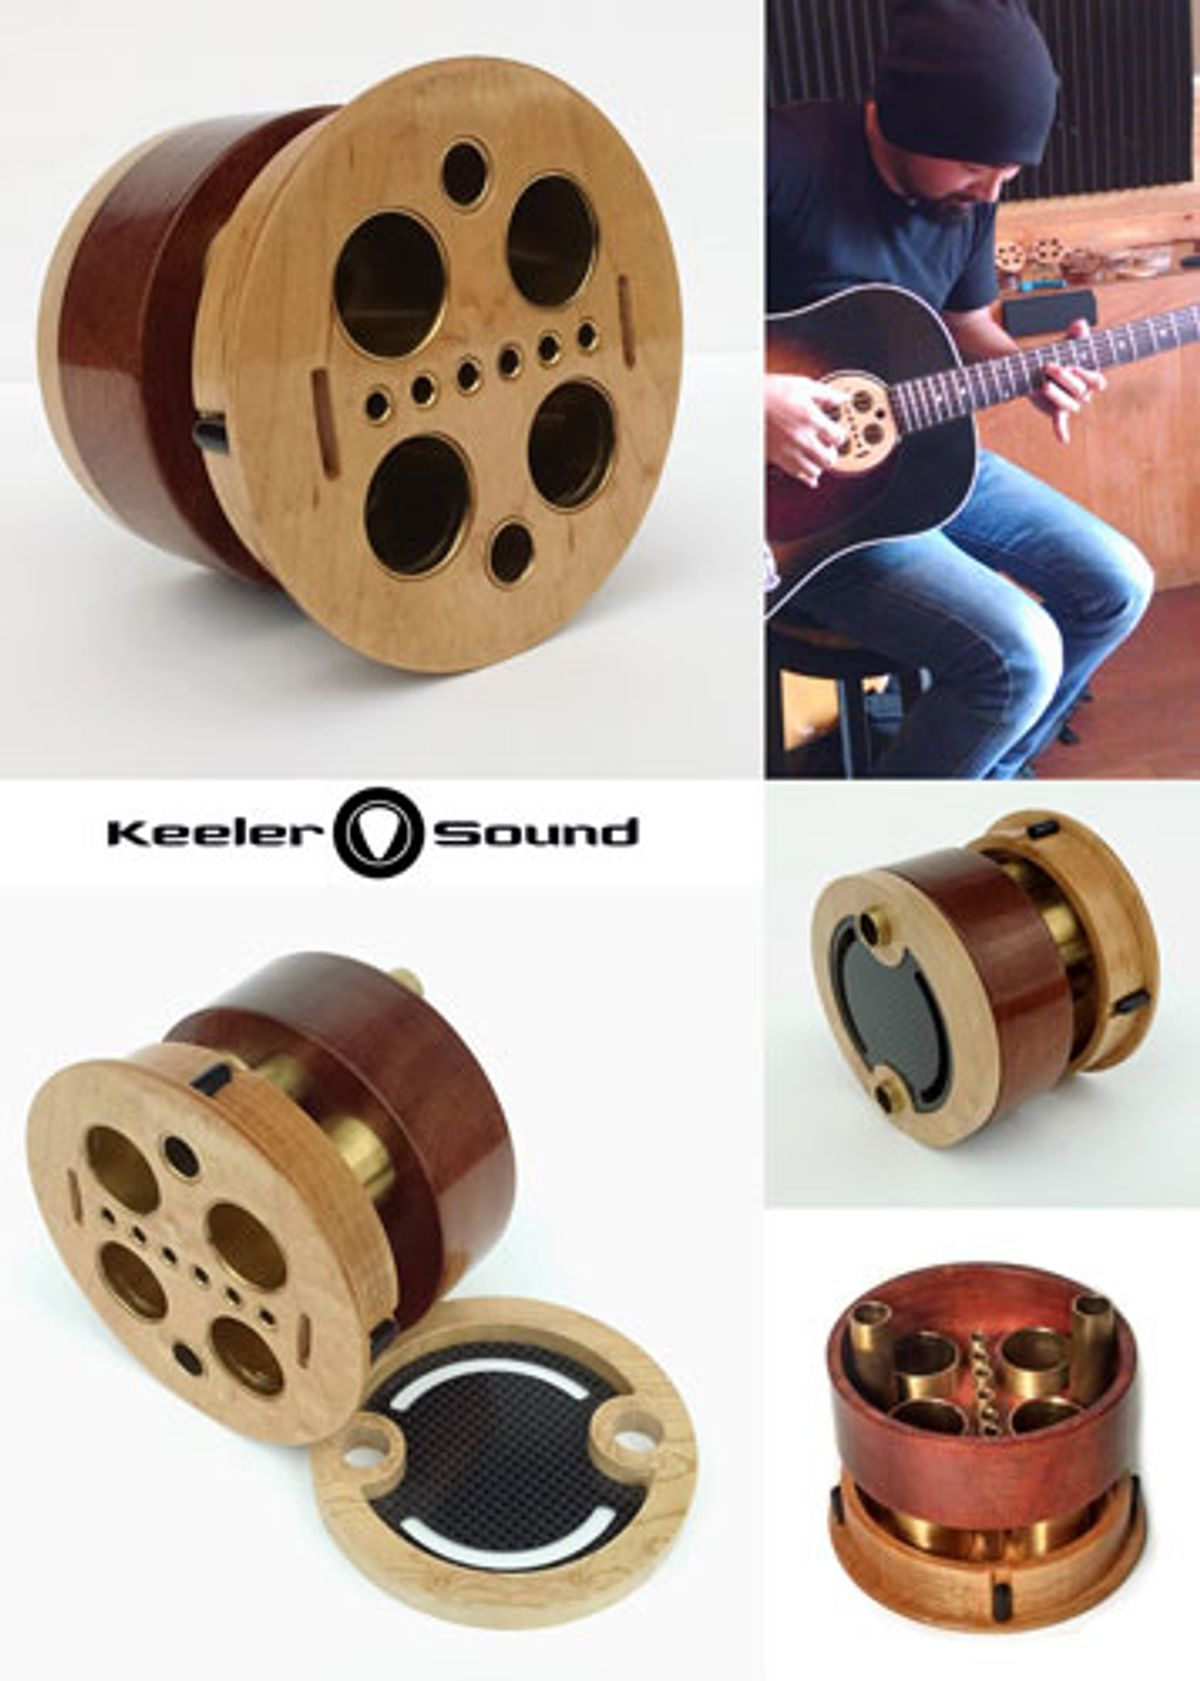 Keeler Sound Introduces Line of Sound Processors